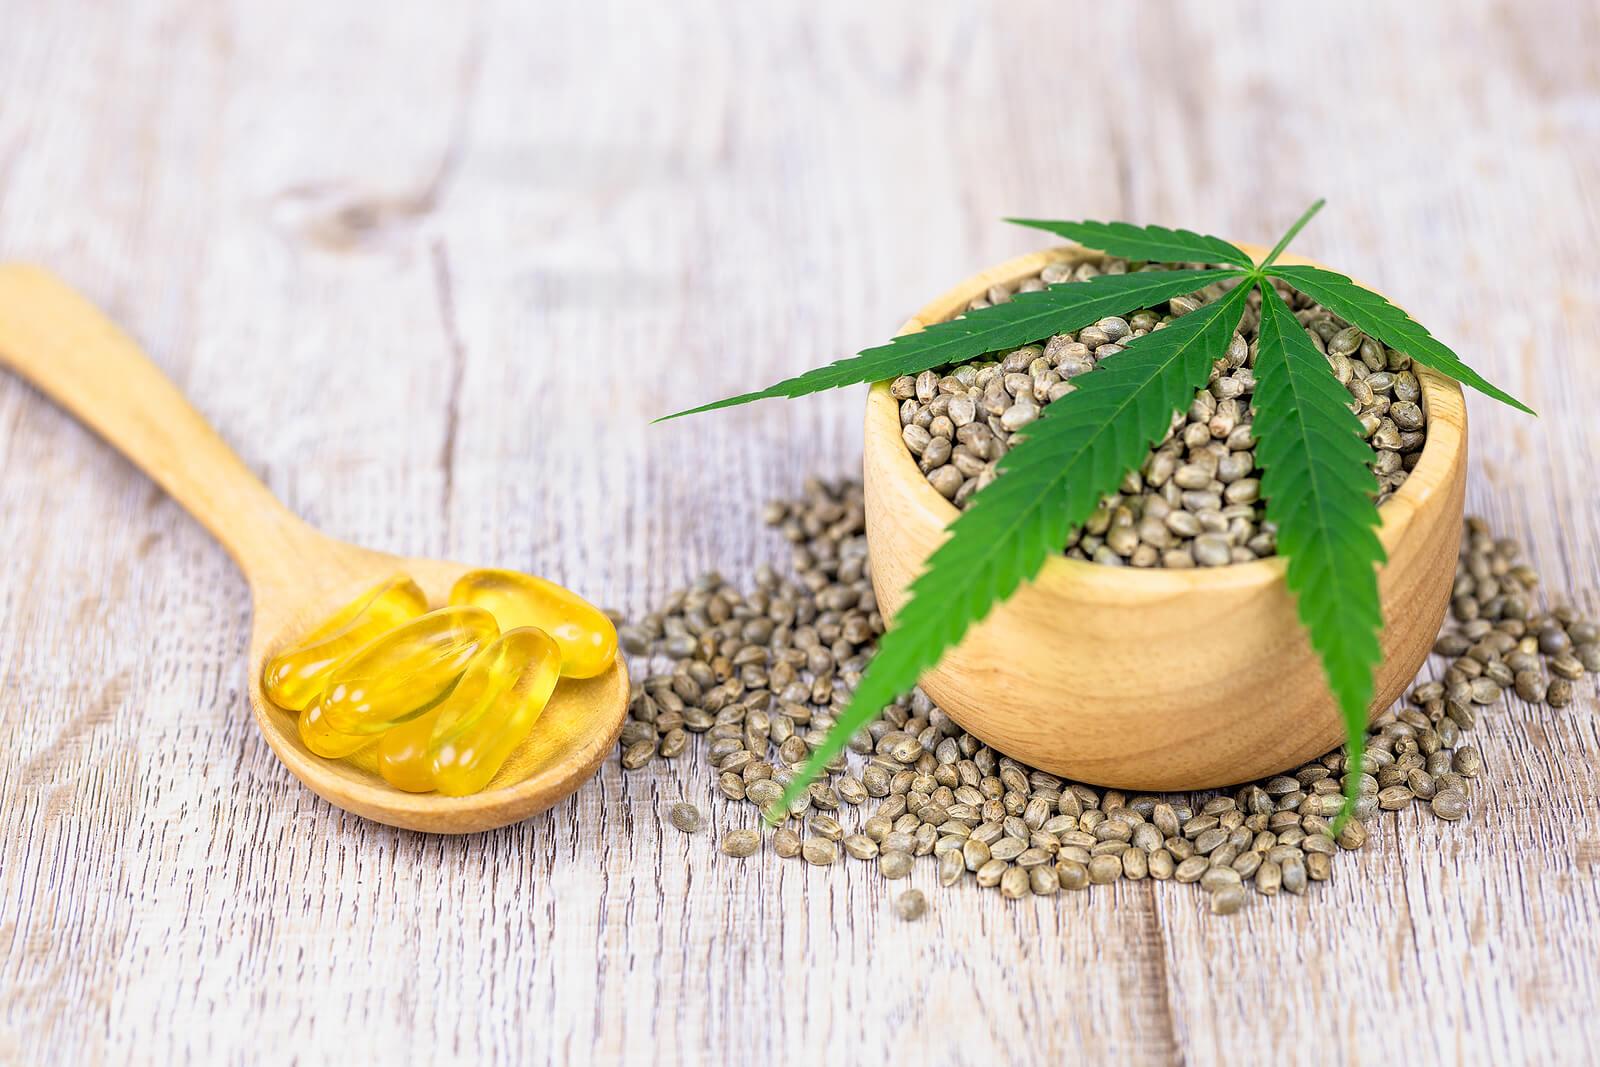 Buy Marijuana Seeds In Missouri